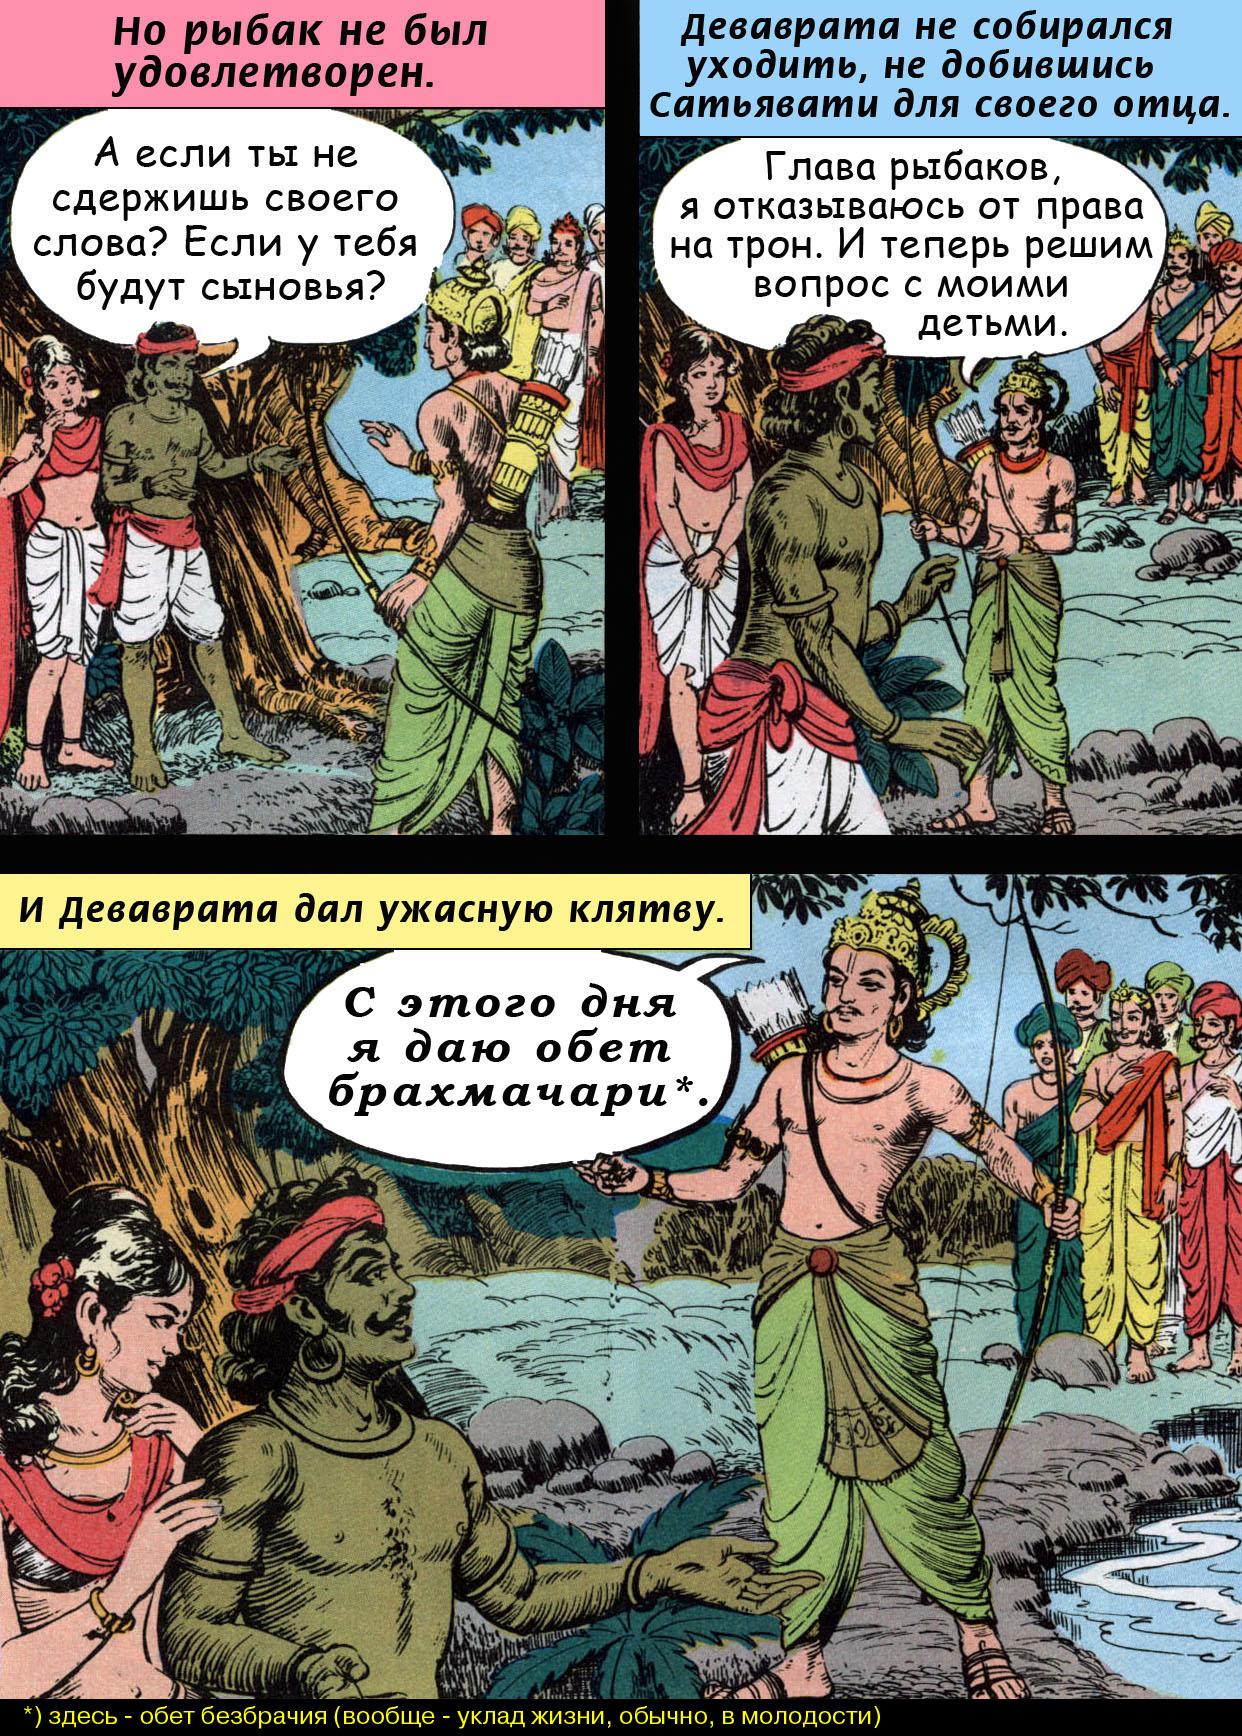 Бхишма 18 - ведический комикс